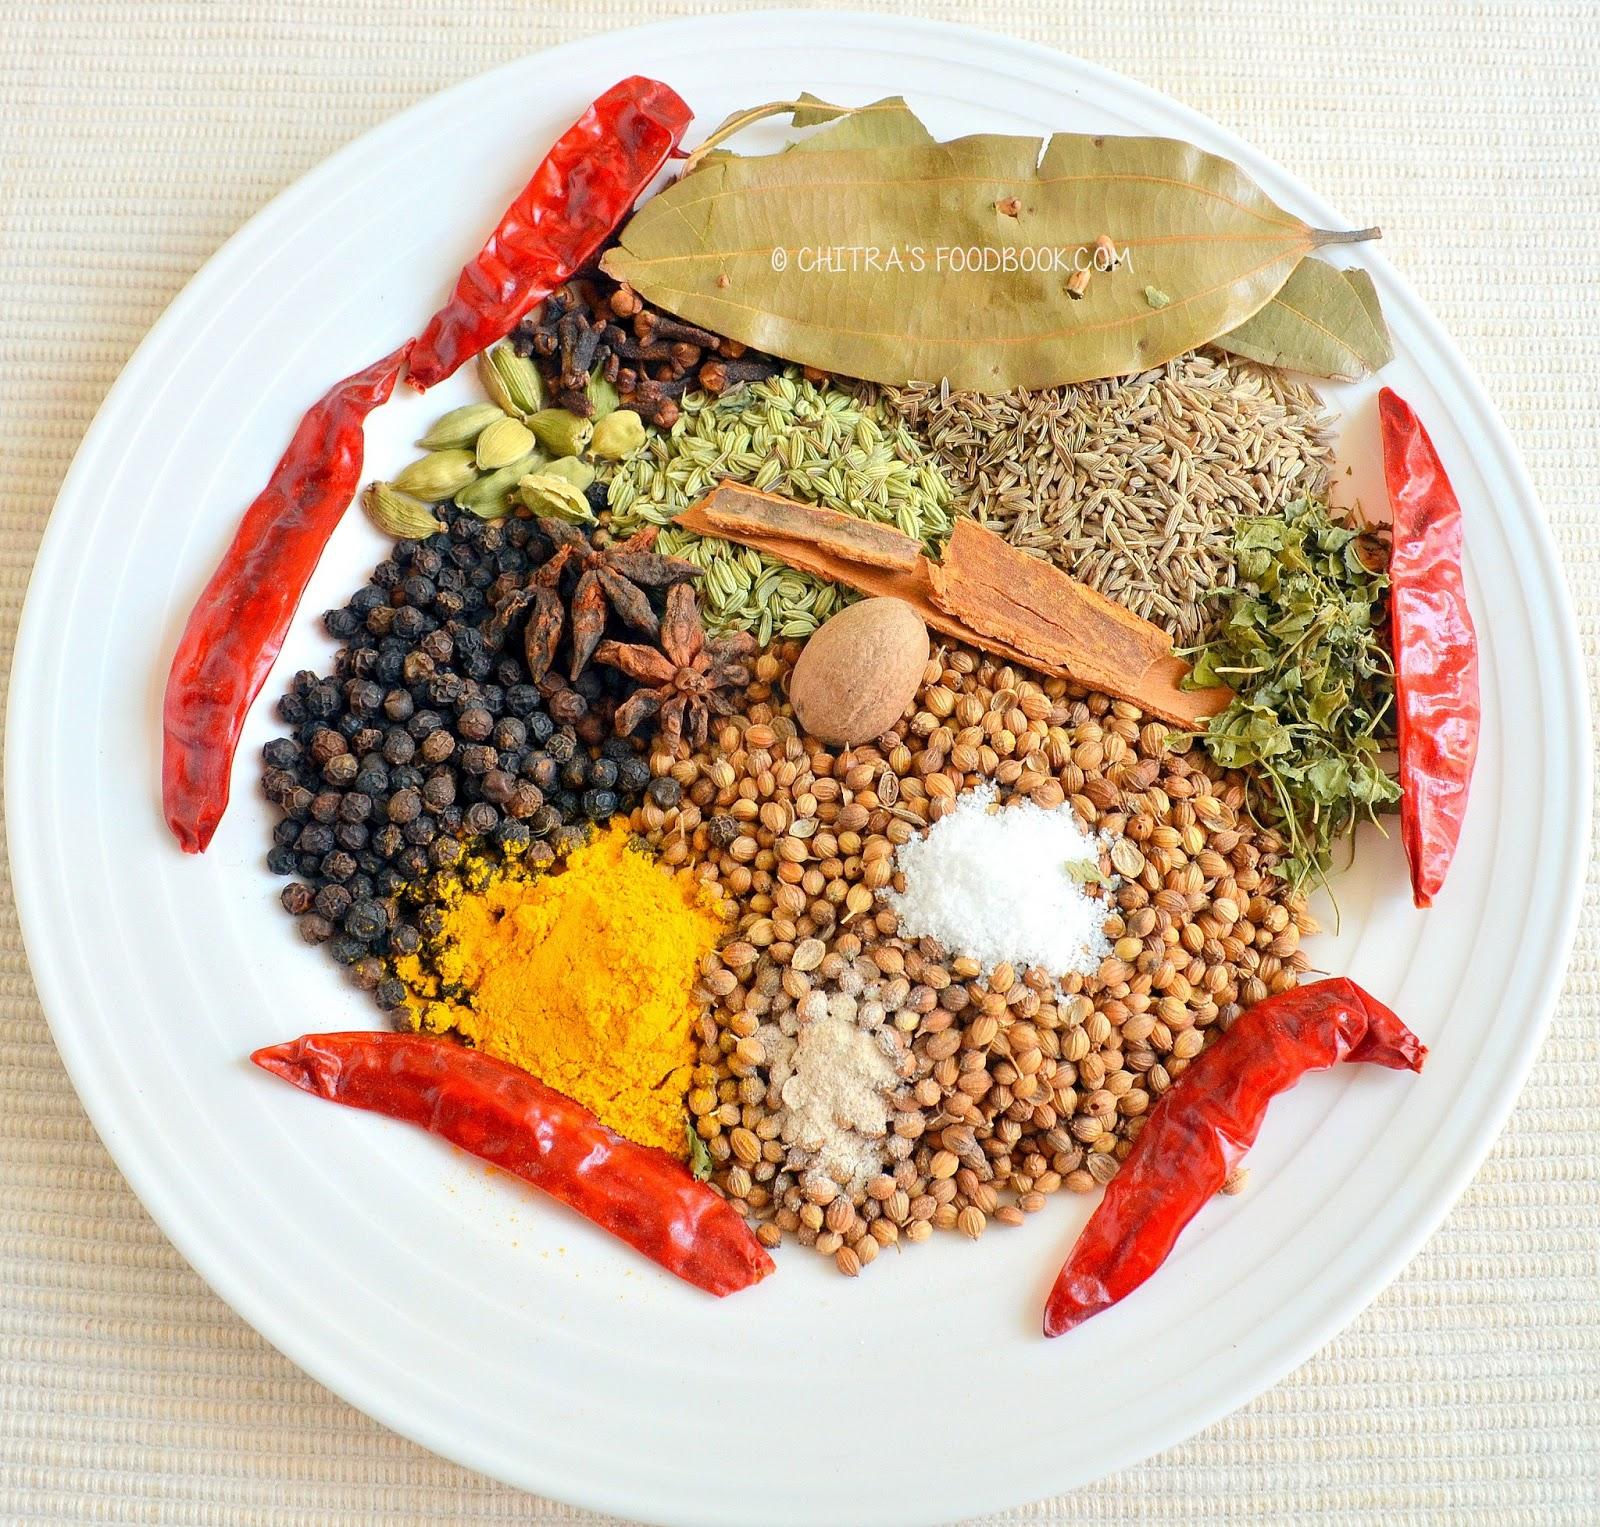 Chitra 39 s food book cooking basics - Garam masala recette ...